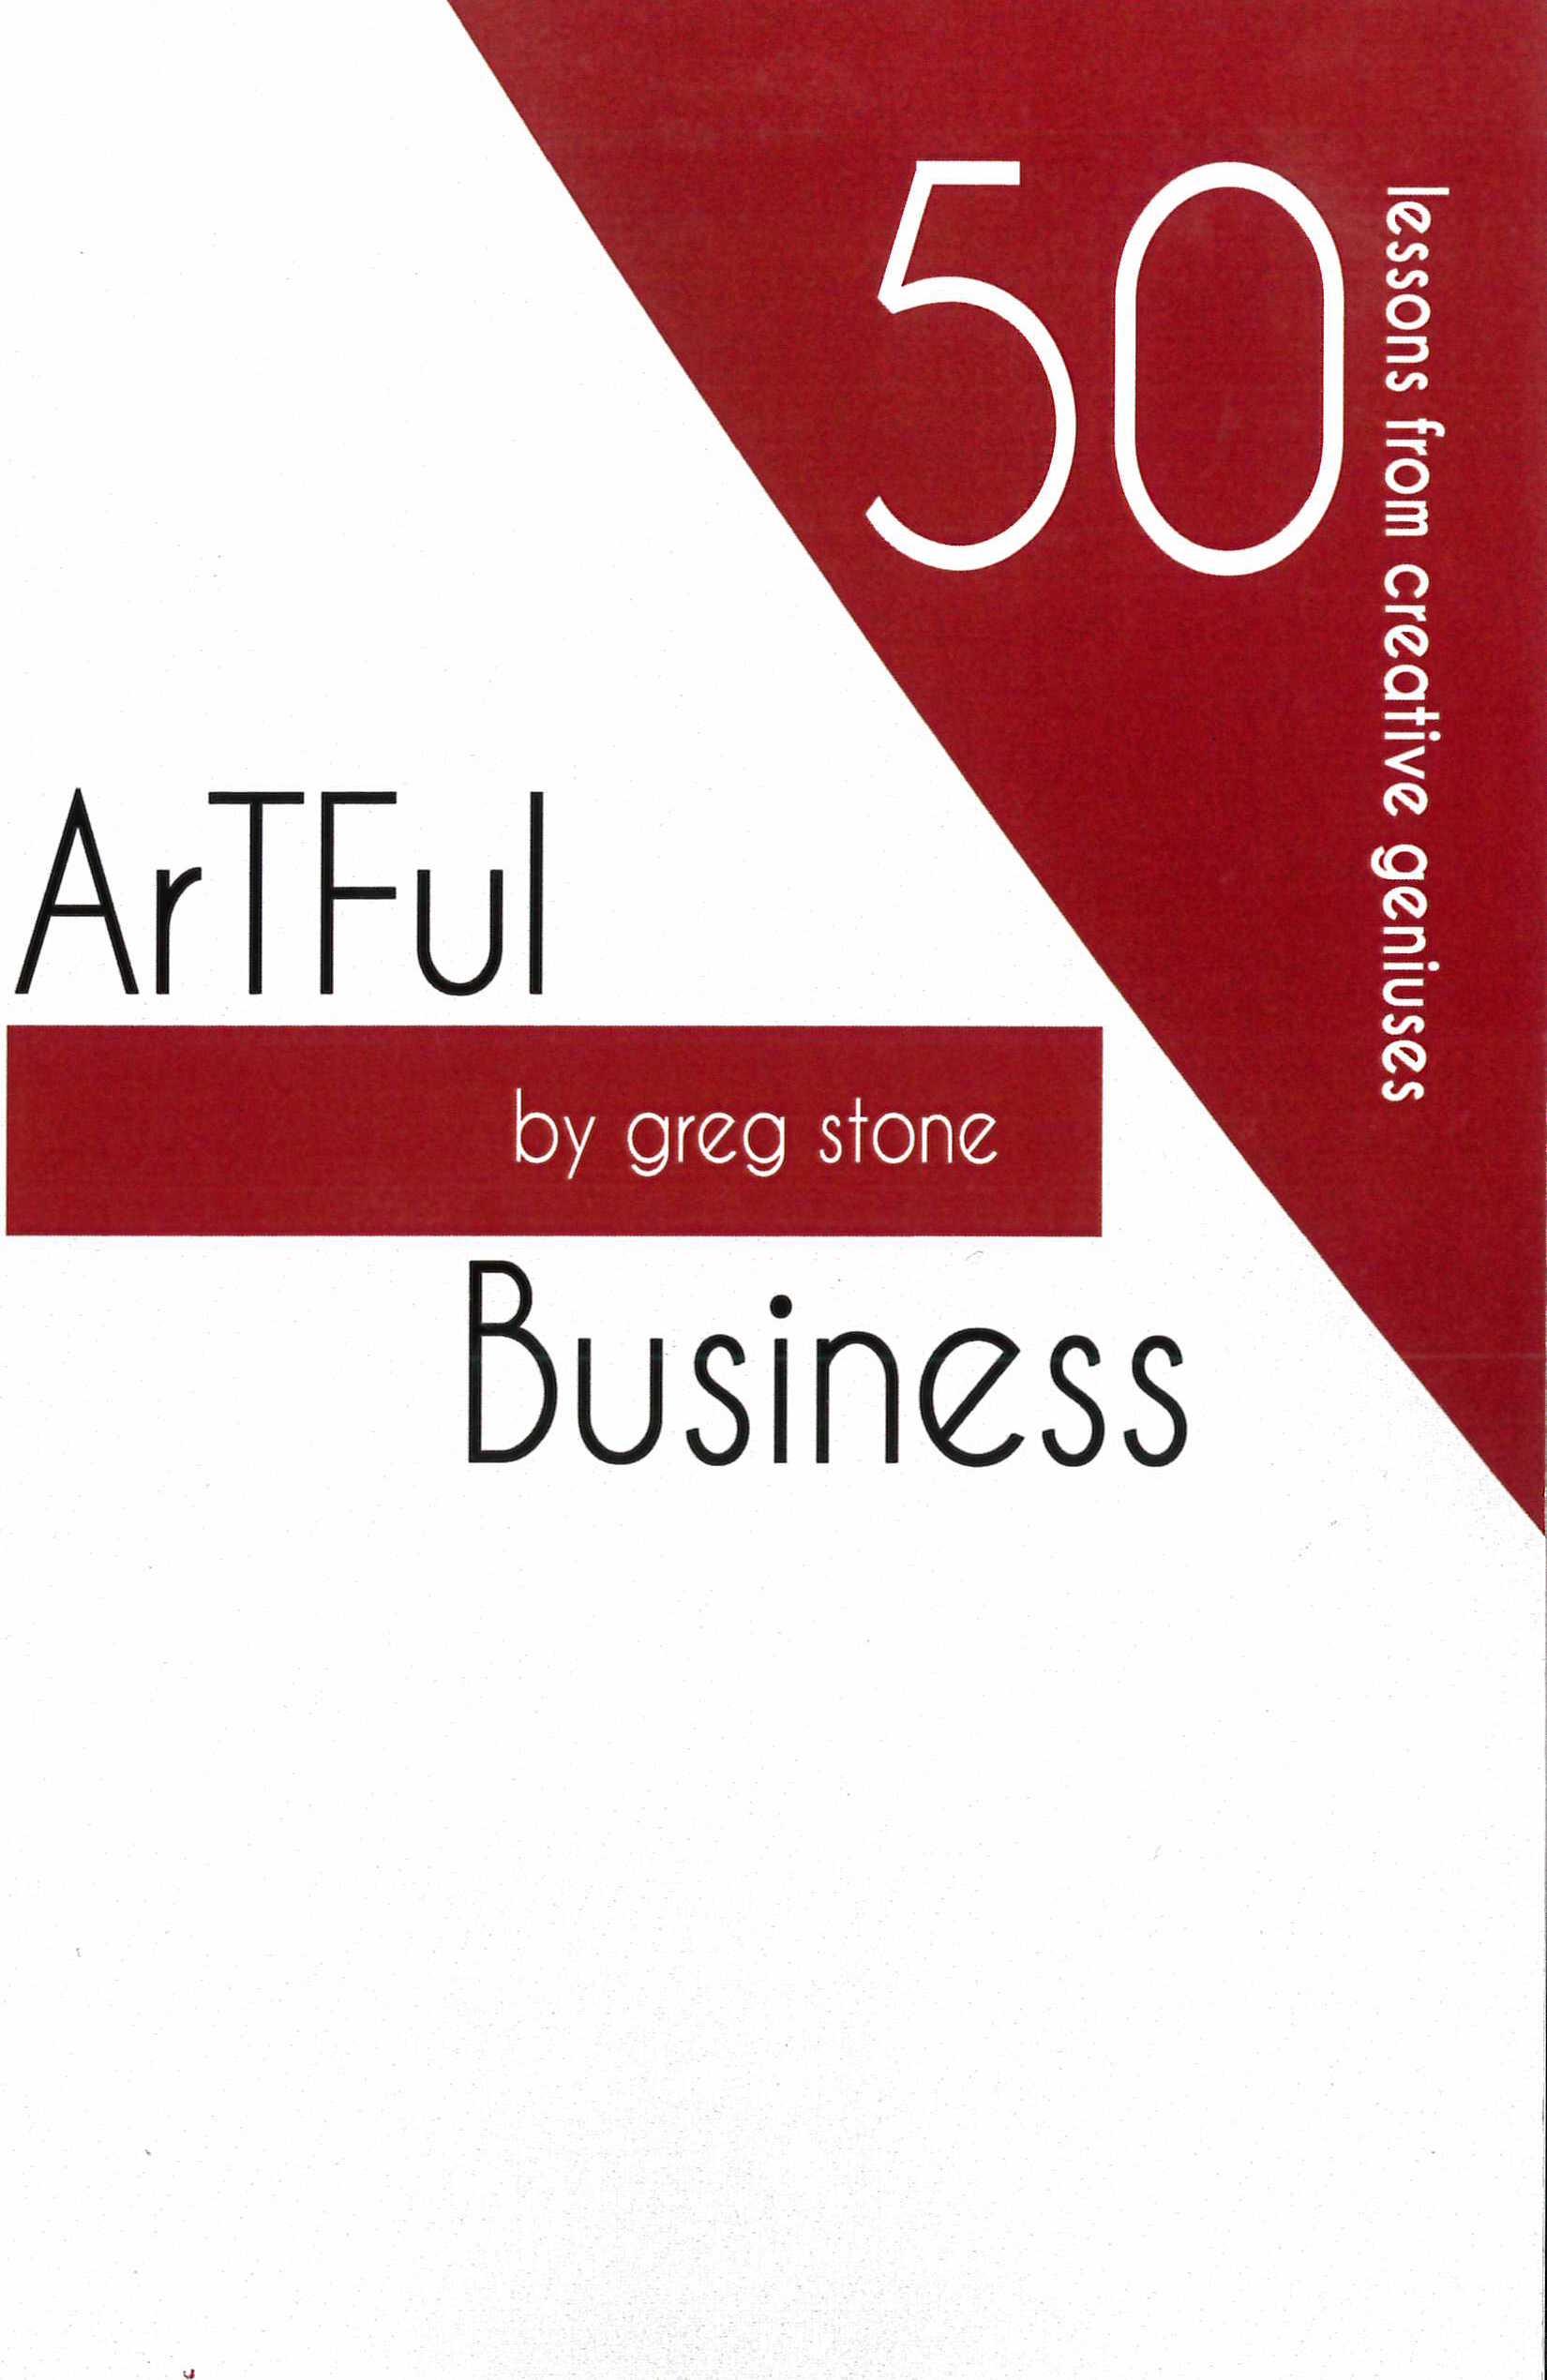 84c3f-artful-business_cover.jpg